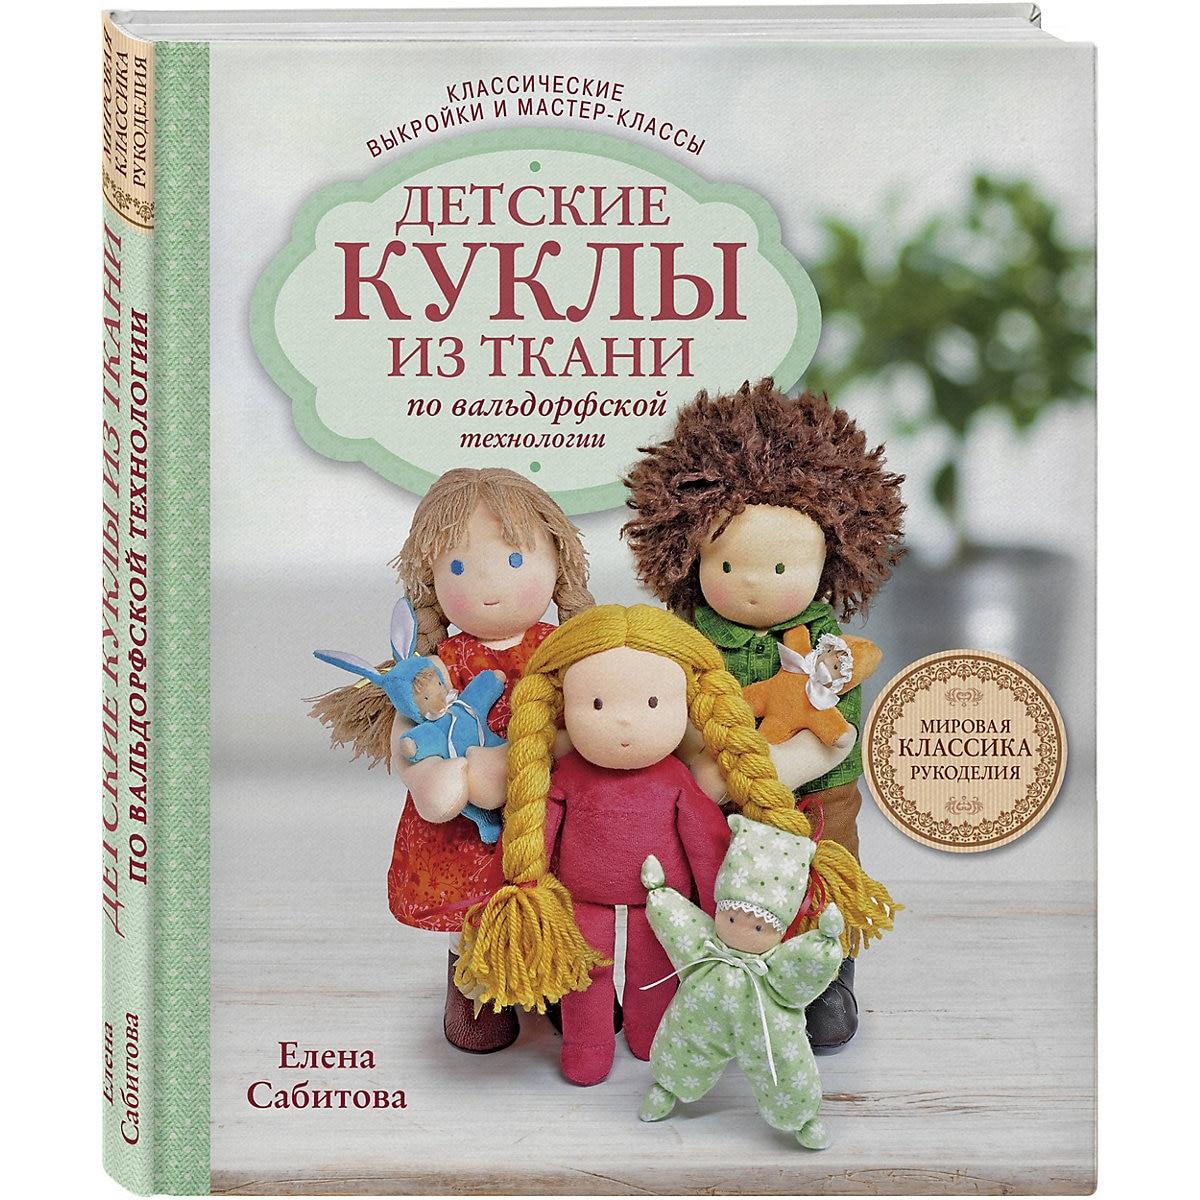 Books EKSMO 9556114 Children Education Encyclopedia Alphabet Dictionary Book For Baby MTpromo